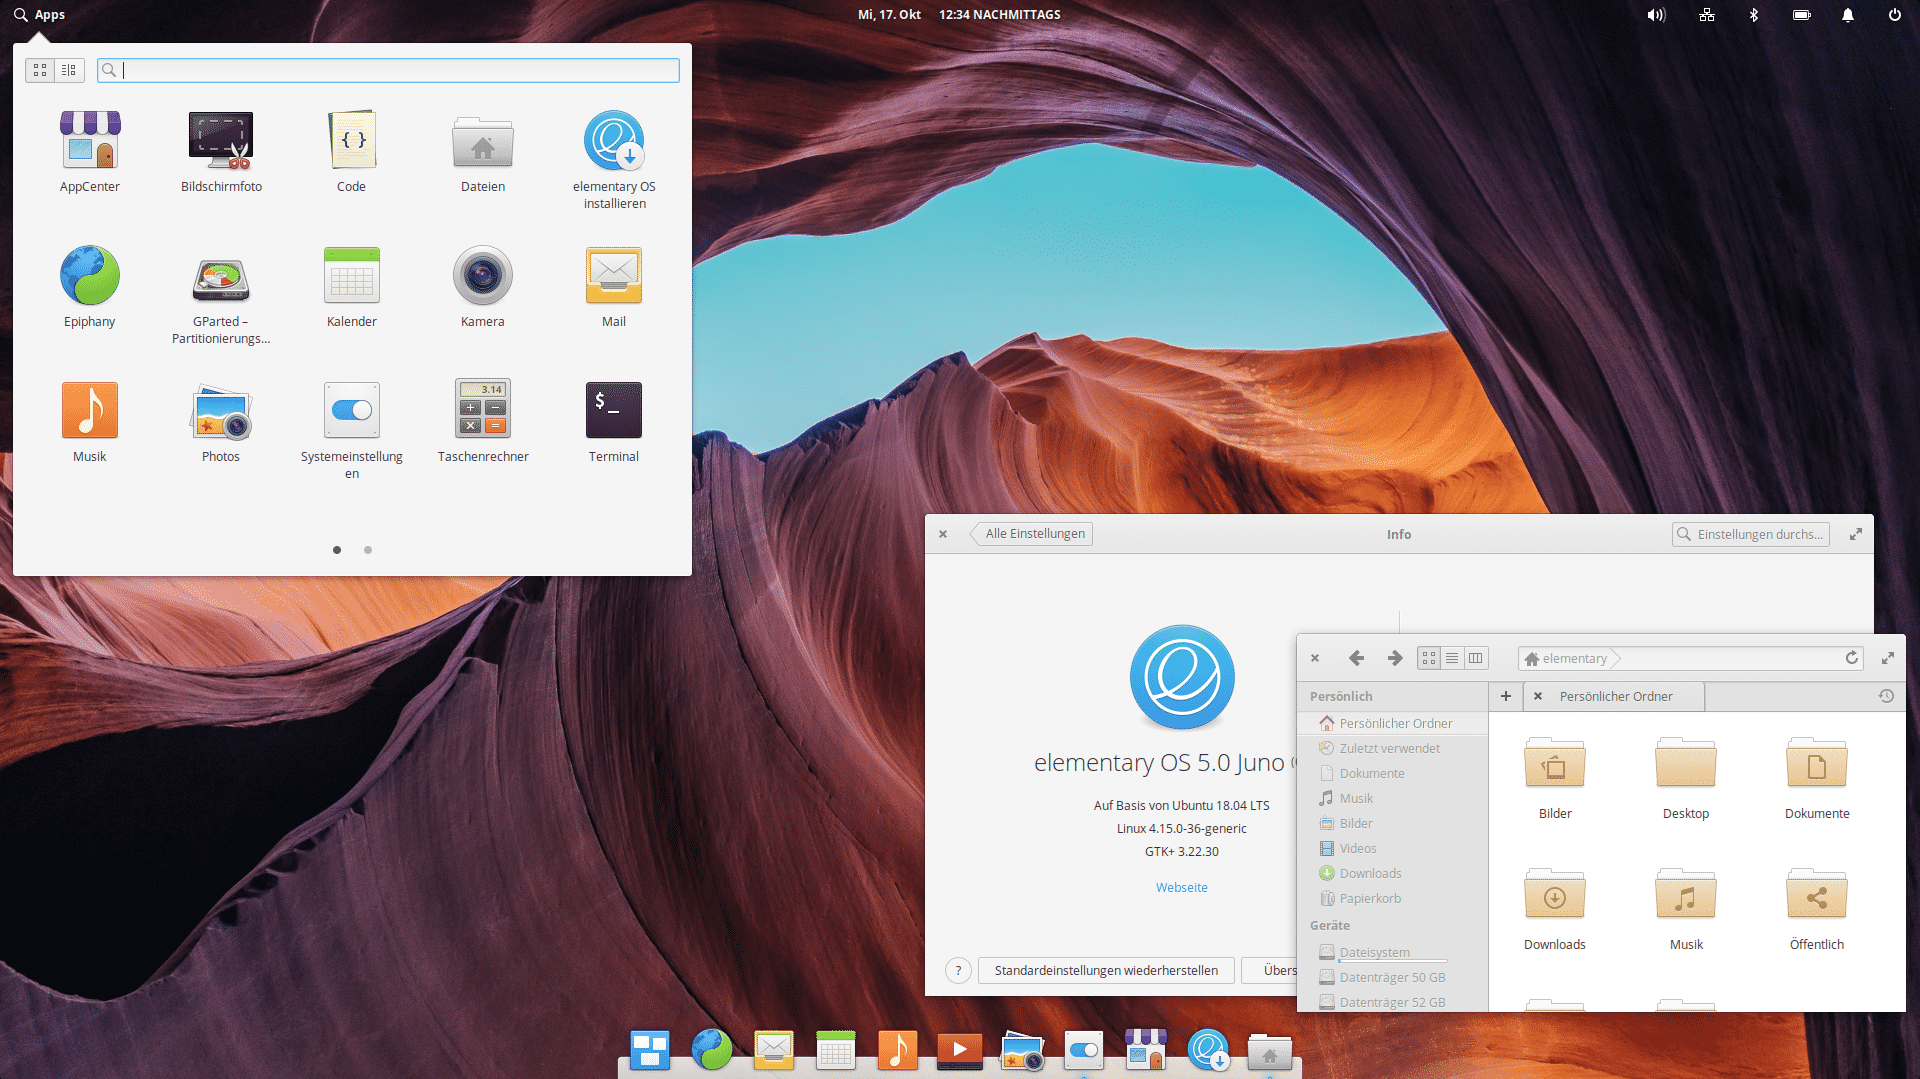 elementary OS 5.0 Juno